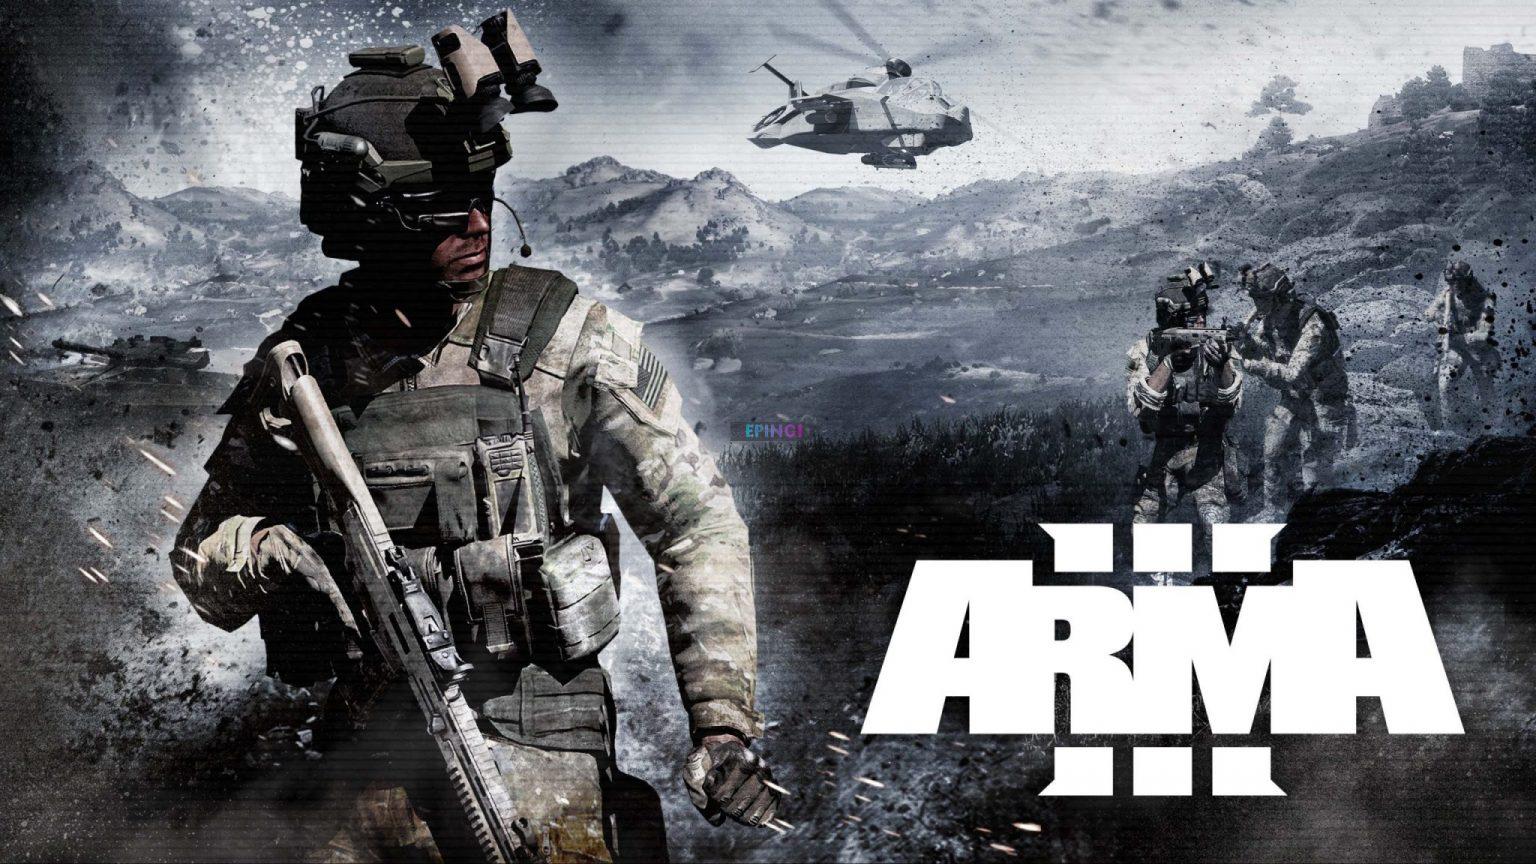 Arma 3 Xbox One Version Full Game Setup Free Download